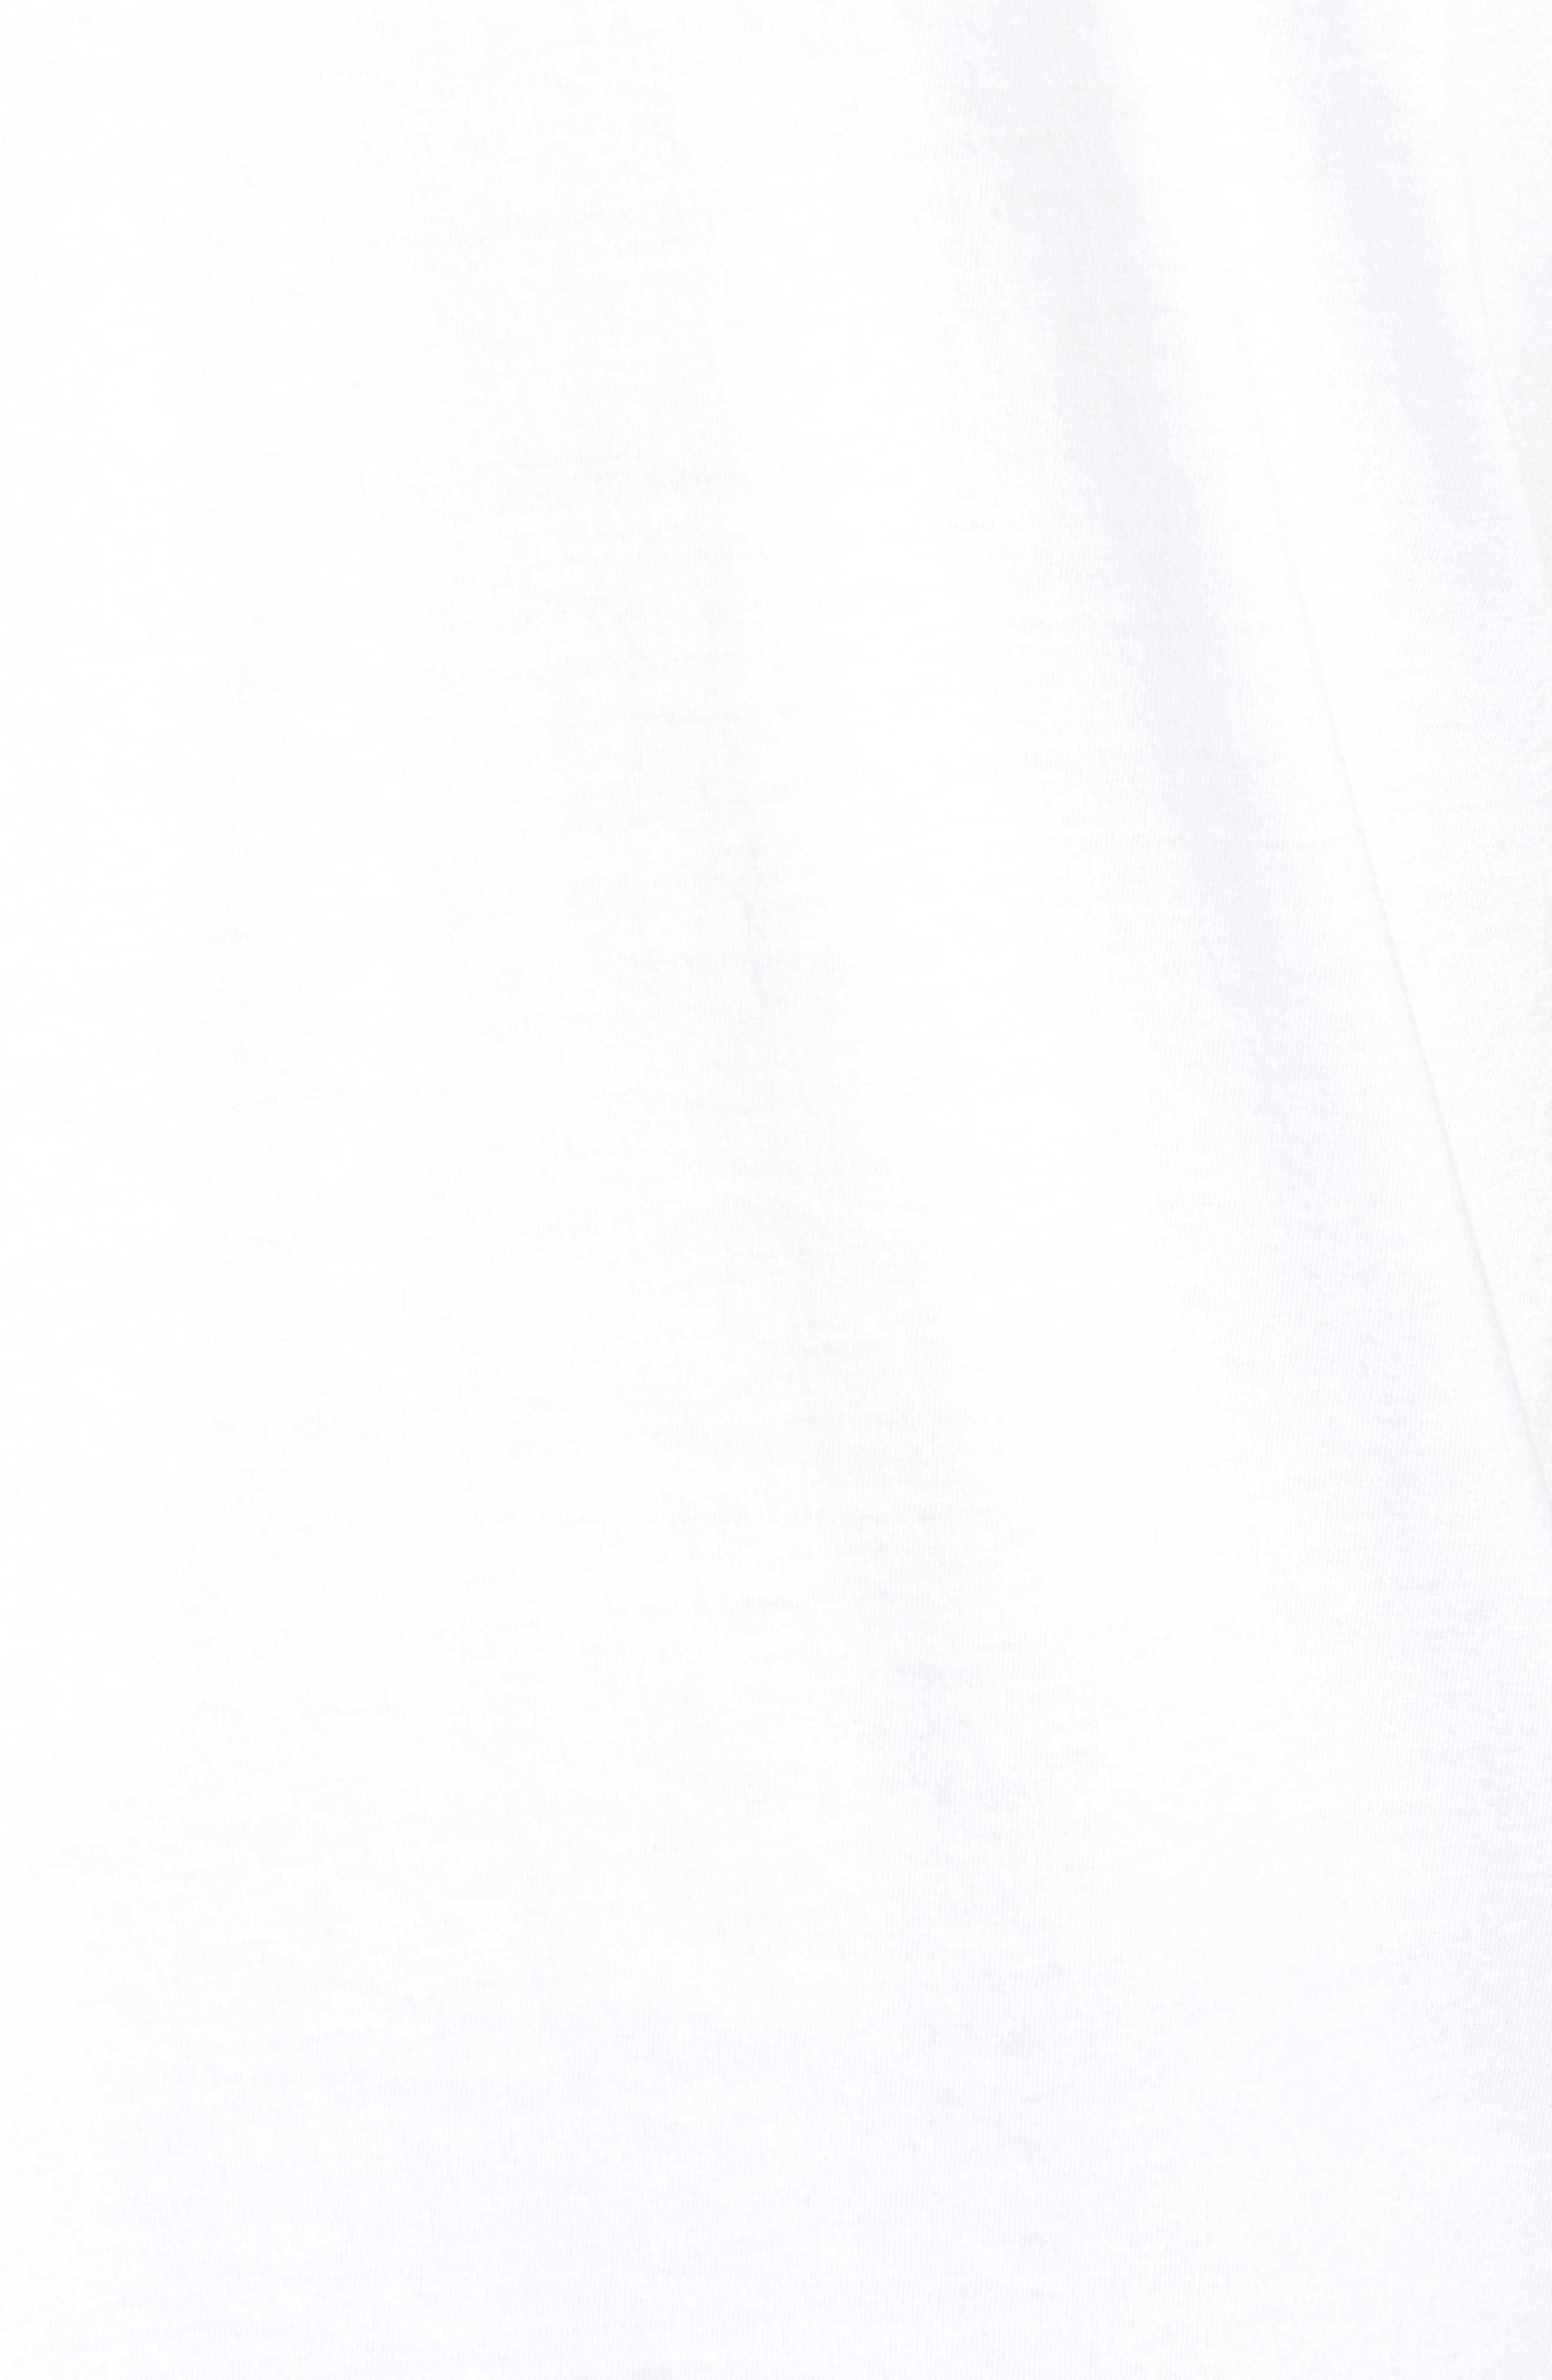 Burch Foam Graphic T-Shirt,                             Alternate thumbnail 5, color,                             White